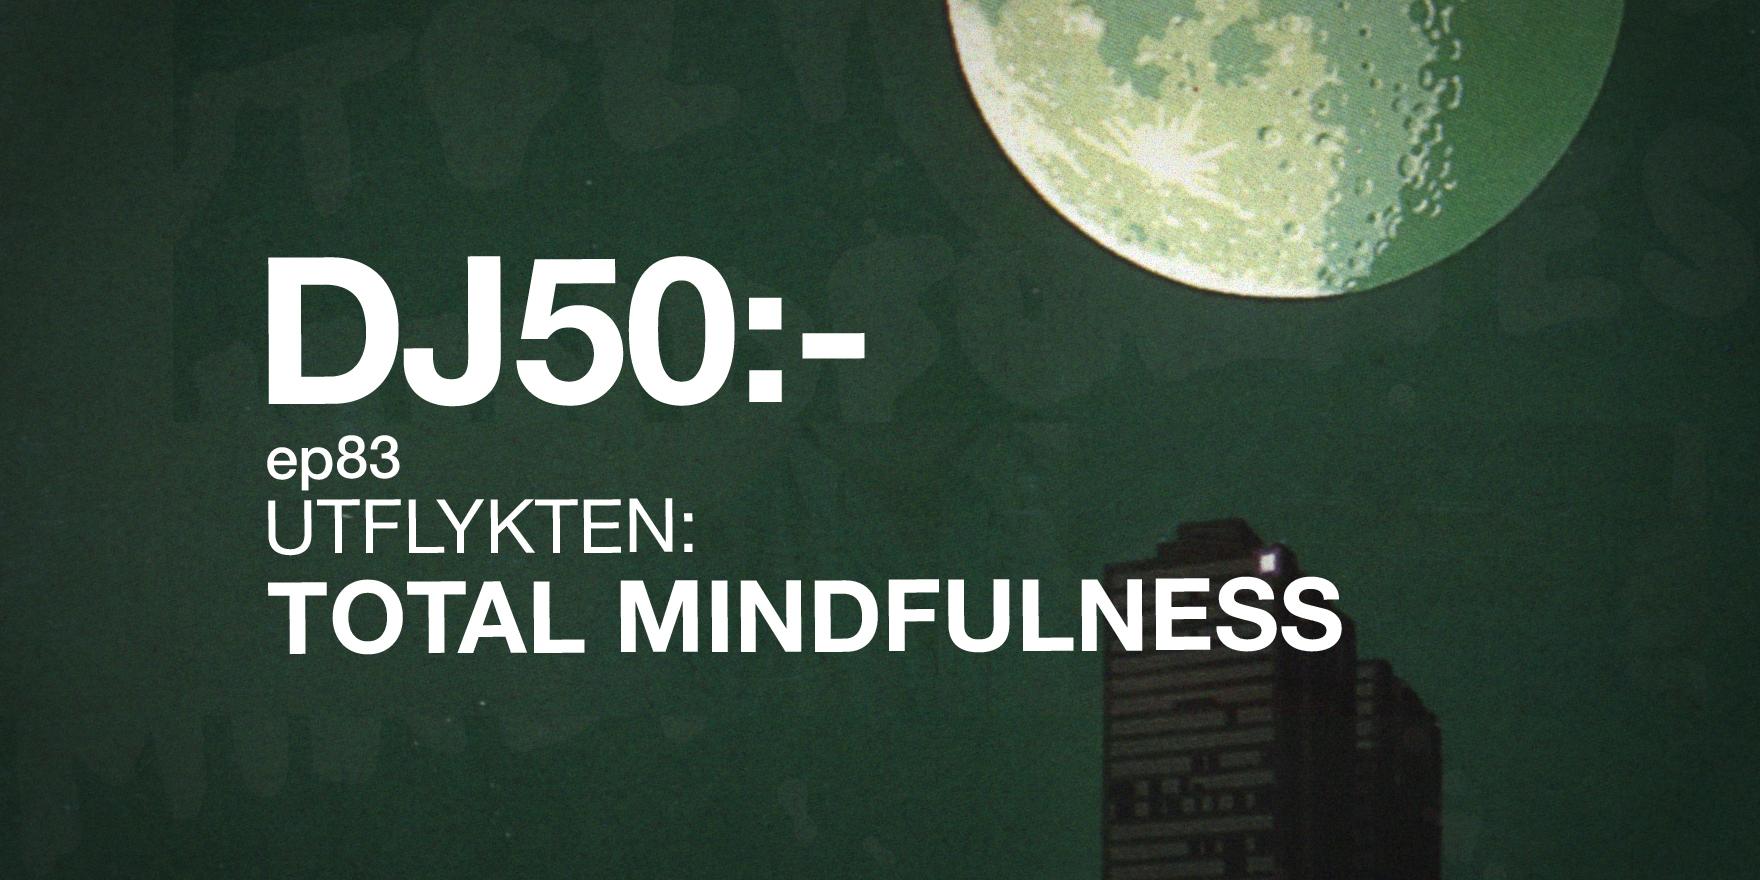 total mindfulness